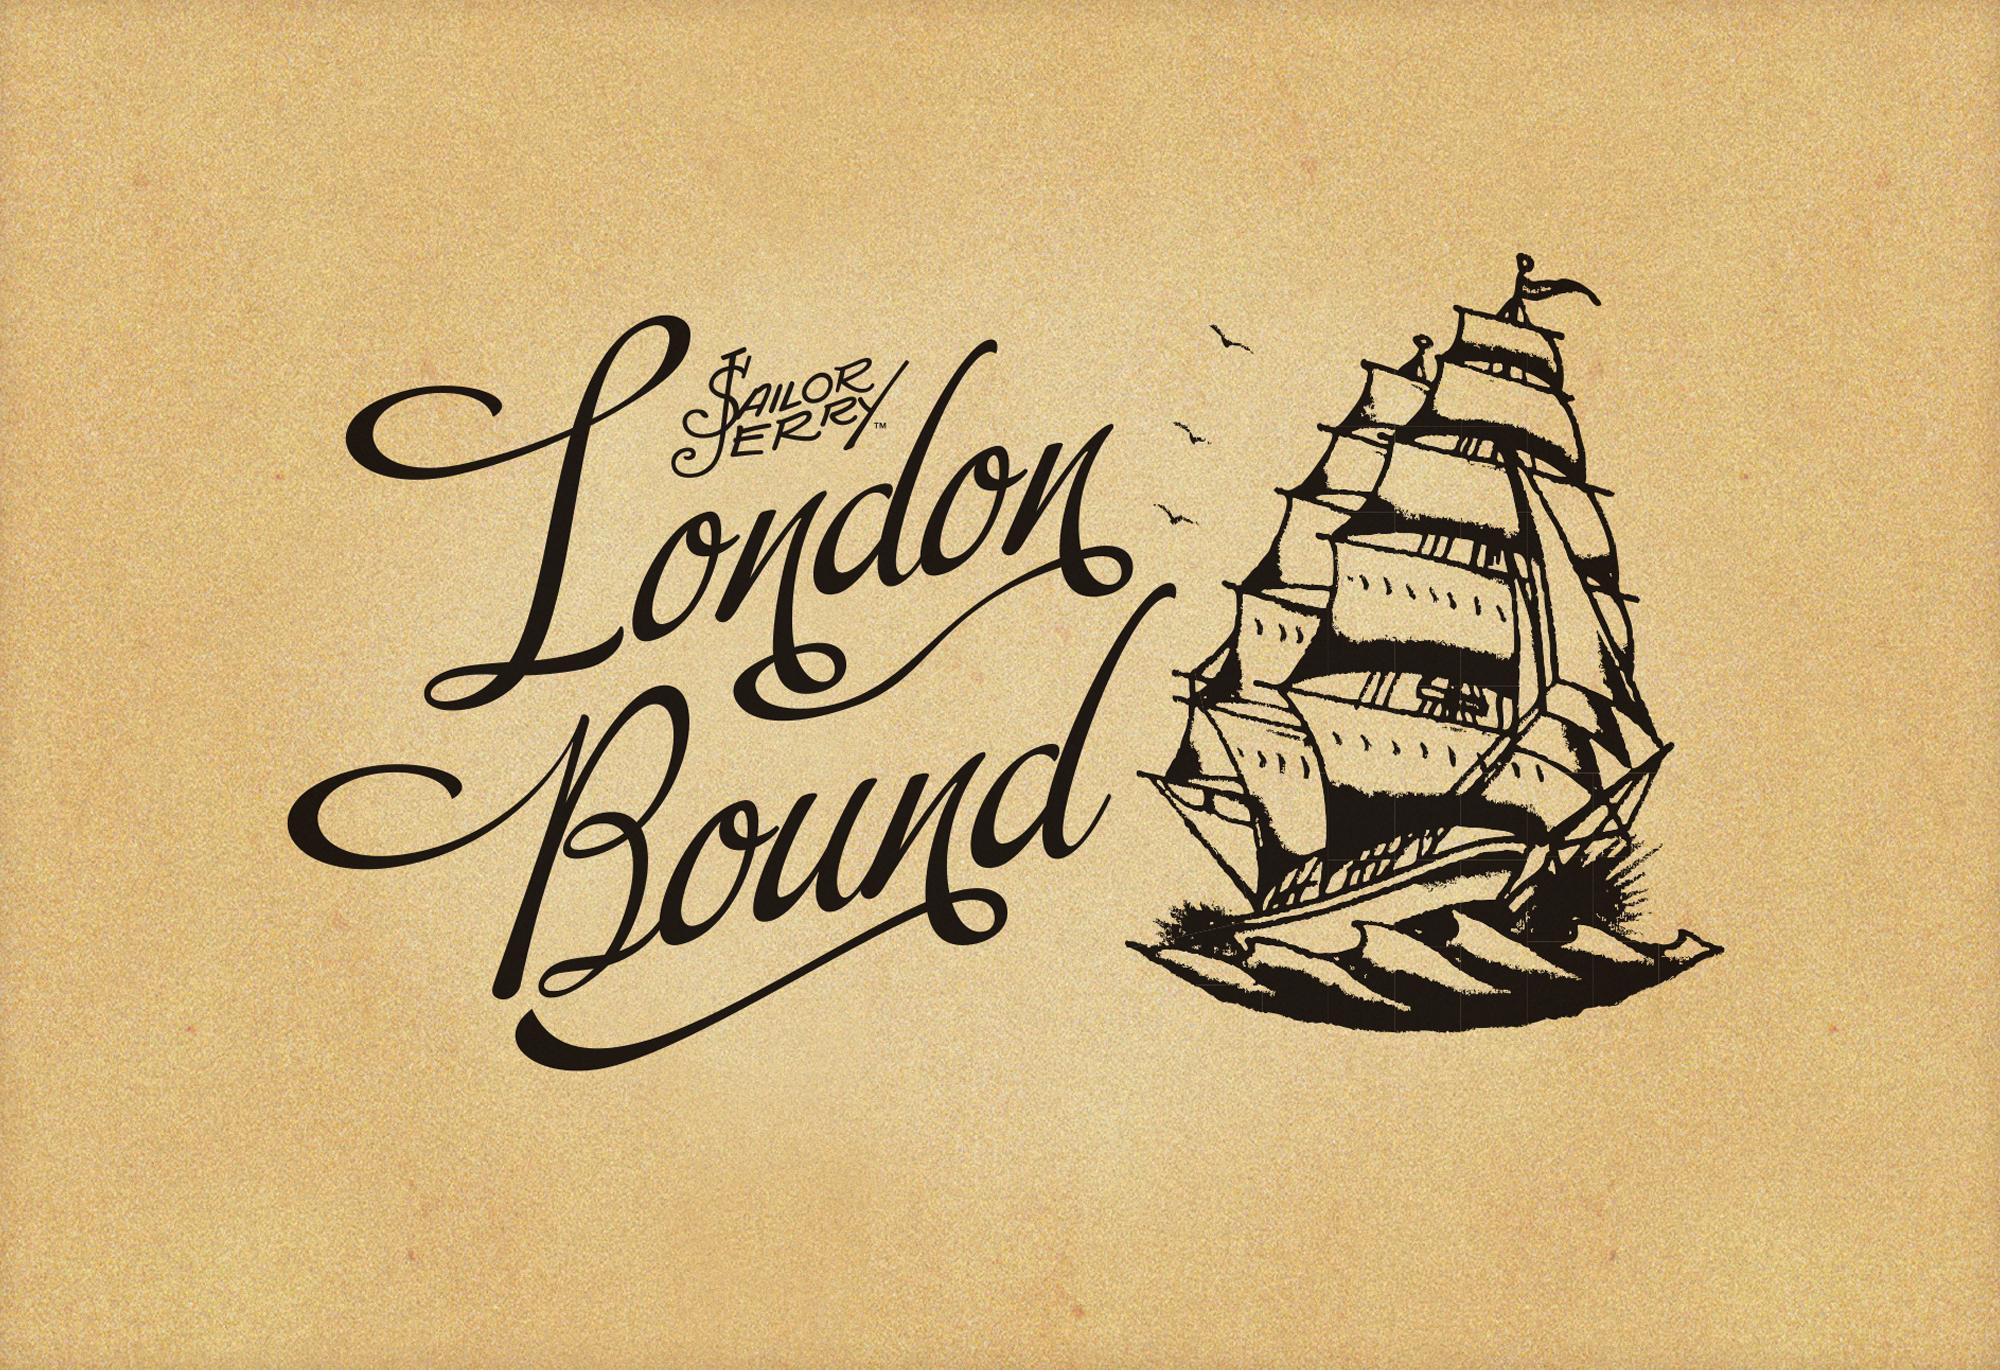 Sailor Jerry London Bound logo